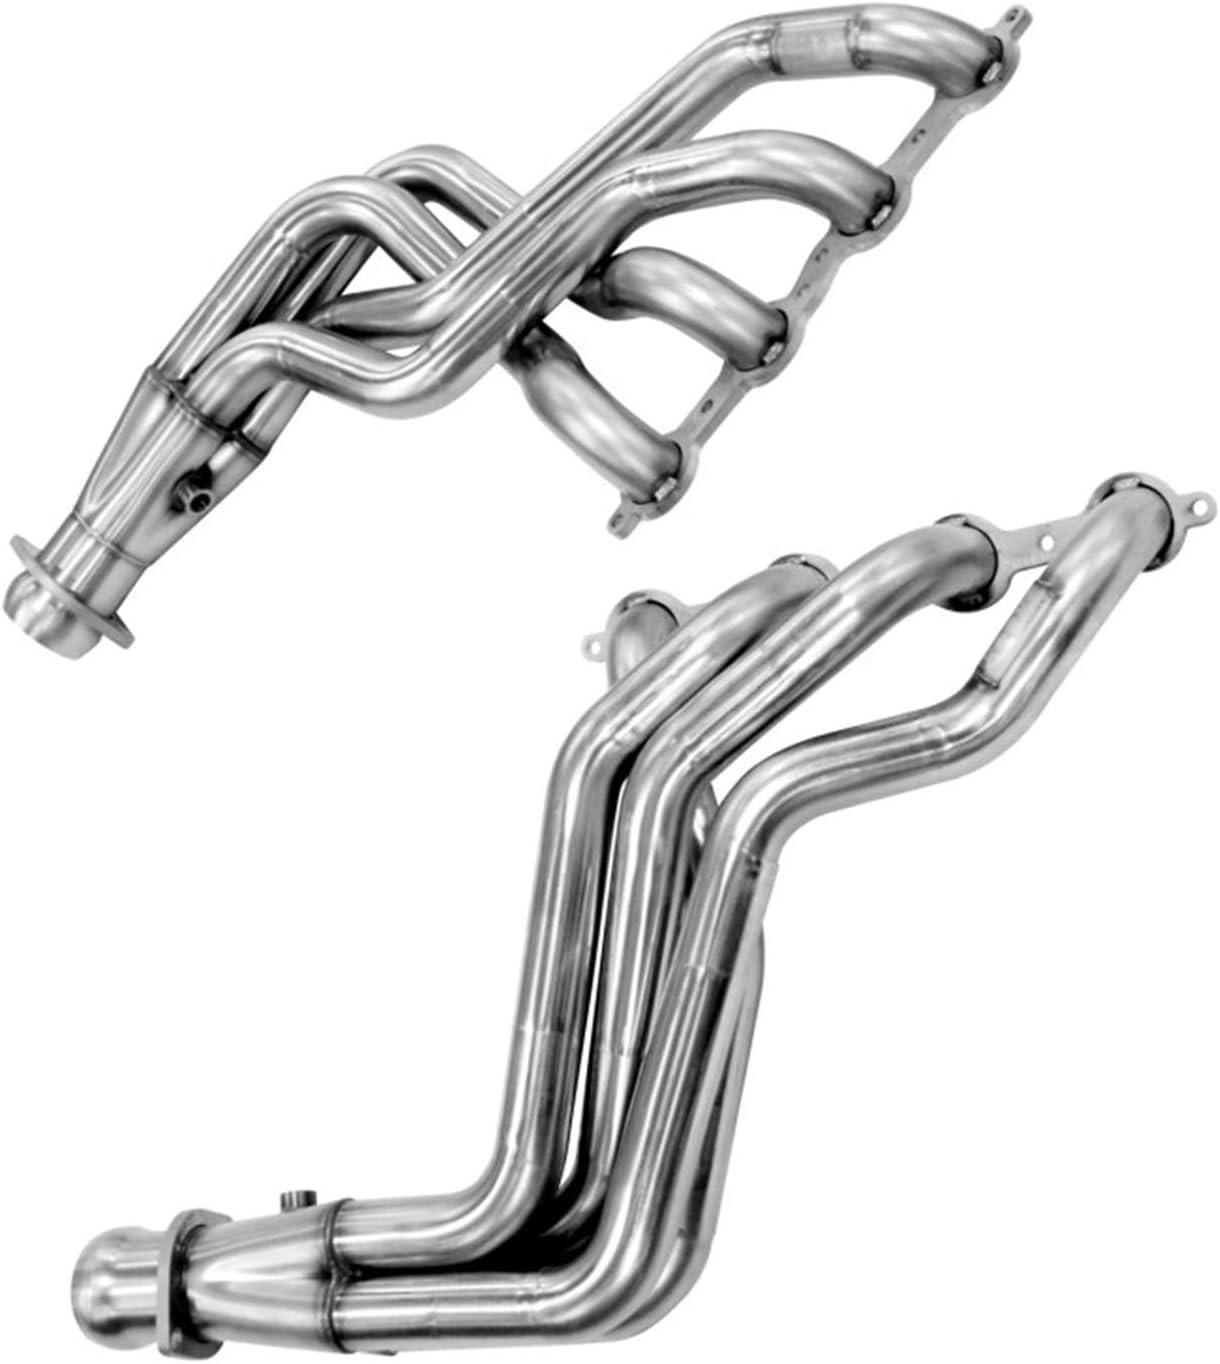 Kooks 06-13 Chevy Corvette C6 ZO6//ZR1 LS9//LS7 6.2L//7.0L 1 7//8in x 3in Headers